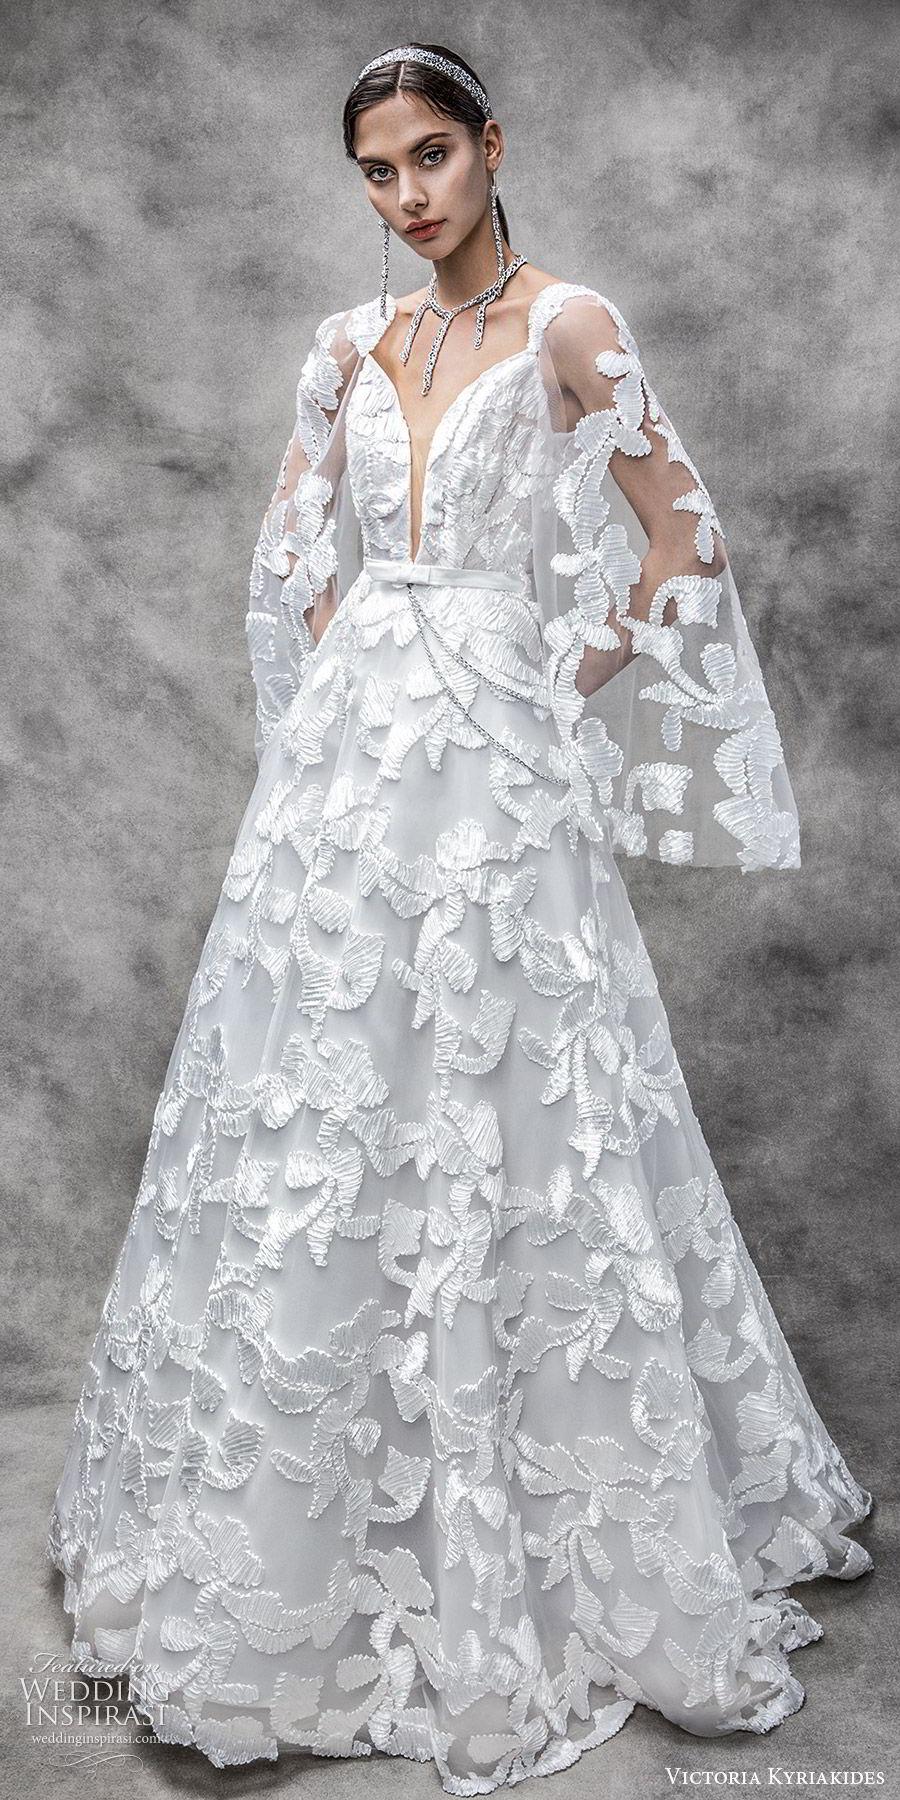 victoria kyriakides spring 2020 bridal sheer pagoda sleeves split sweetheart neckline fully embellished a line ball gown wedding dress (9) modern romantic mv